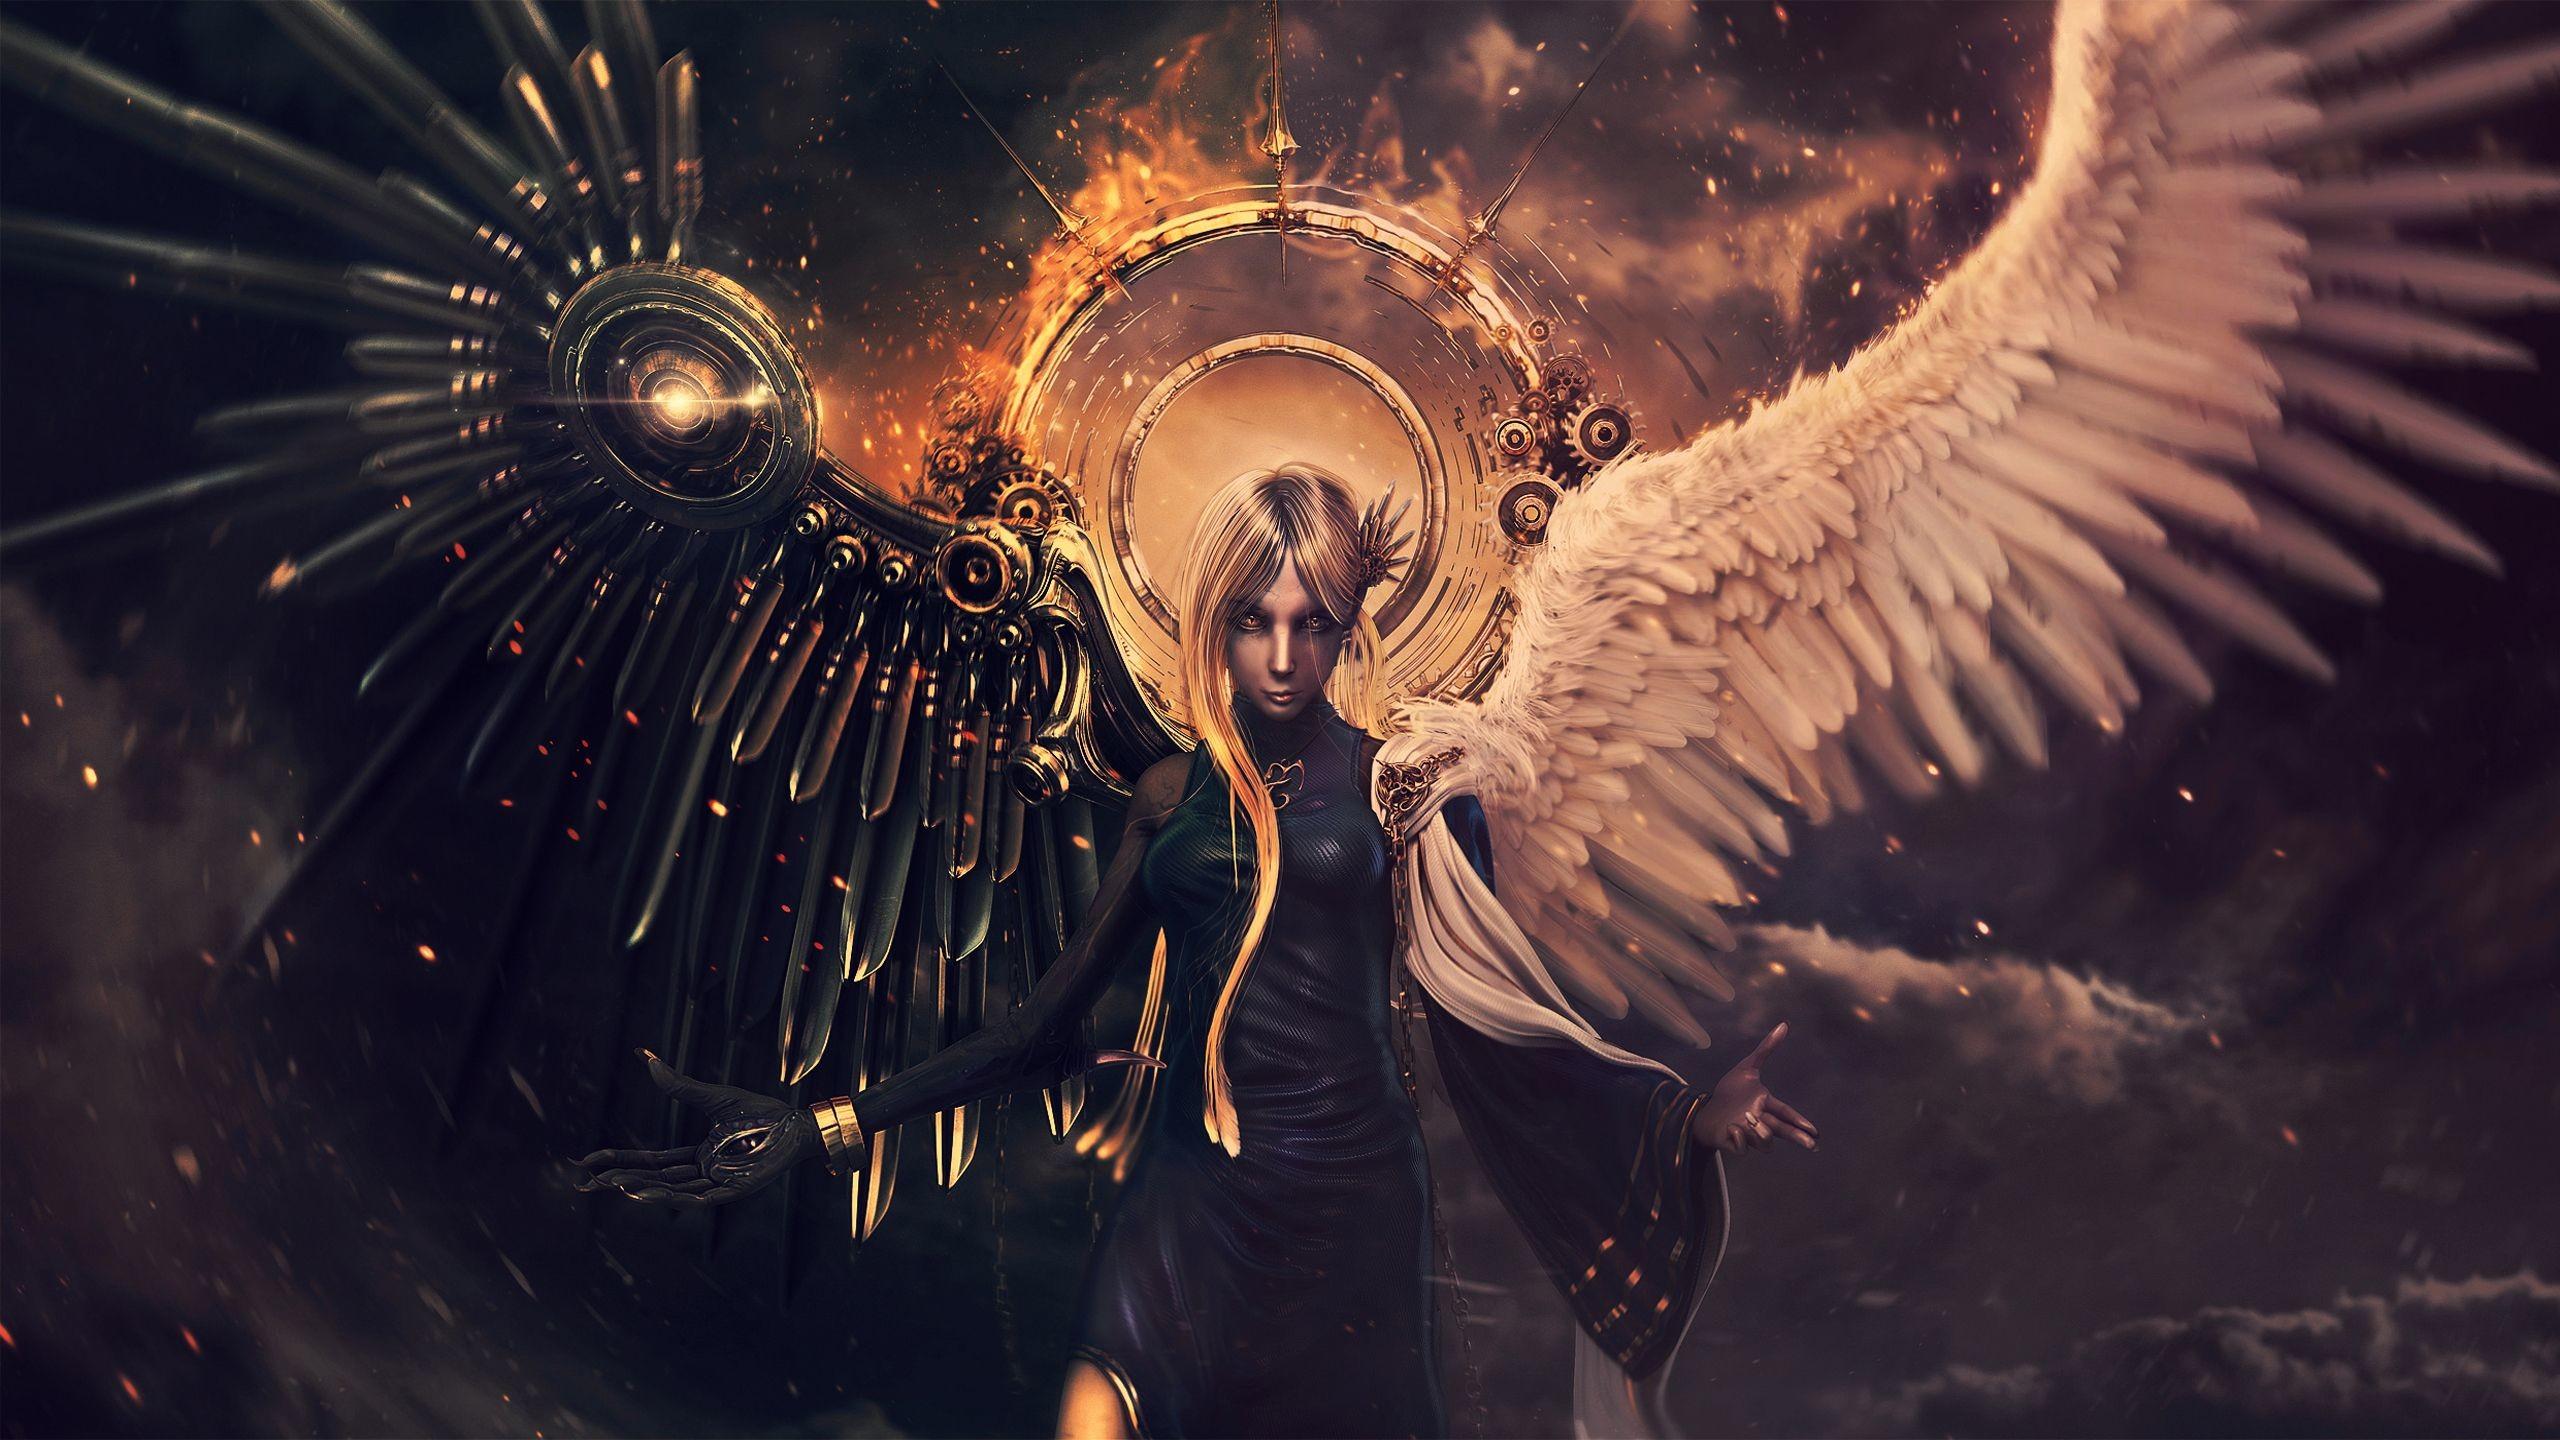 Wallpapersafari: Angels And Demons Wallpapers (61+ Images